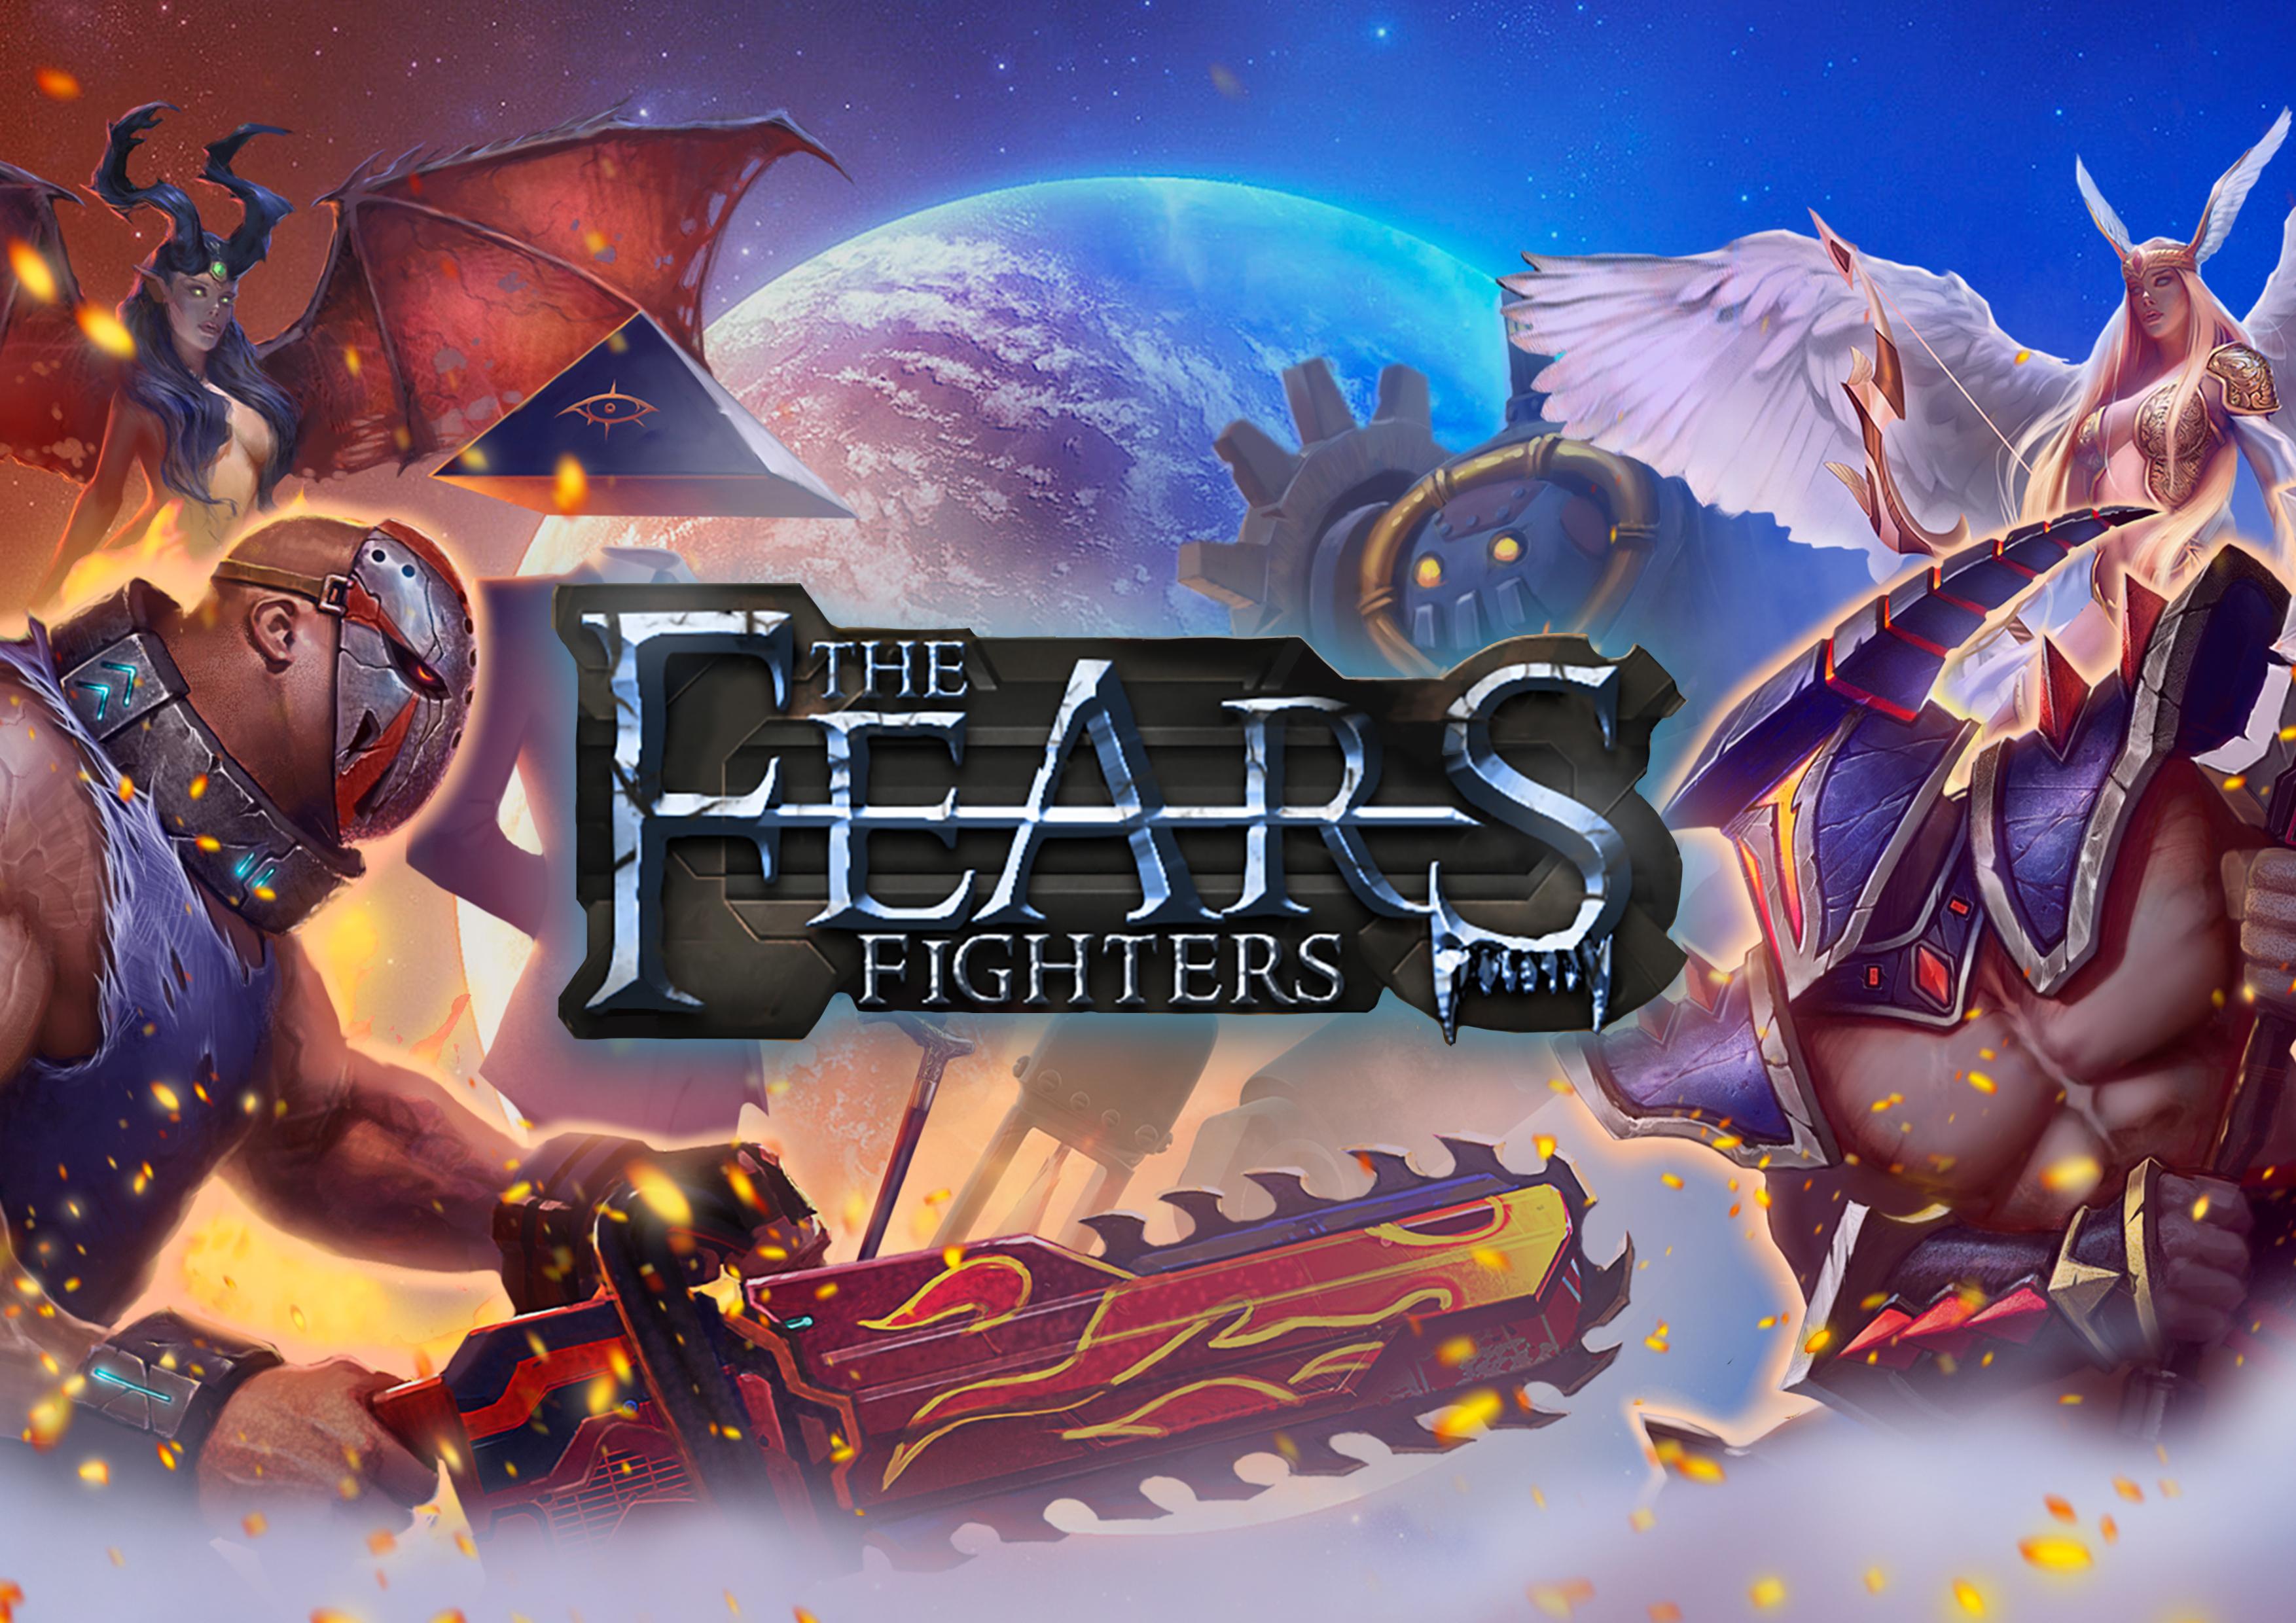 Fears Fighters